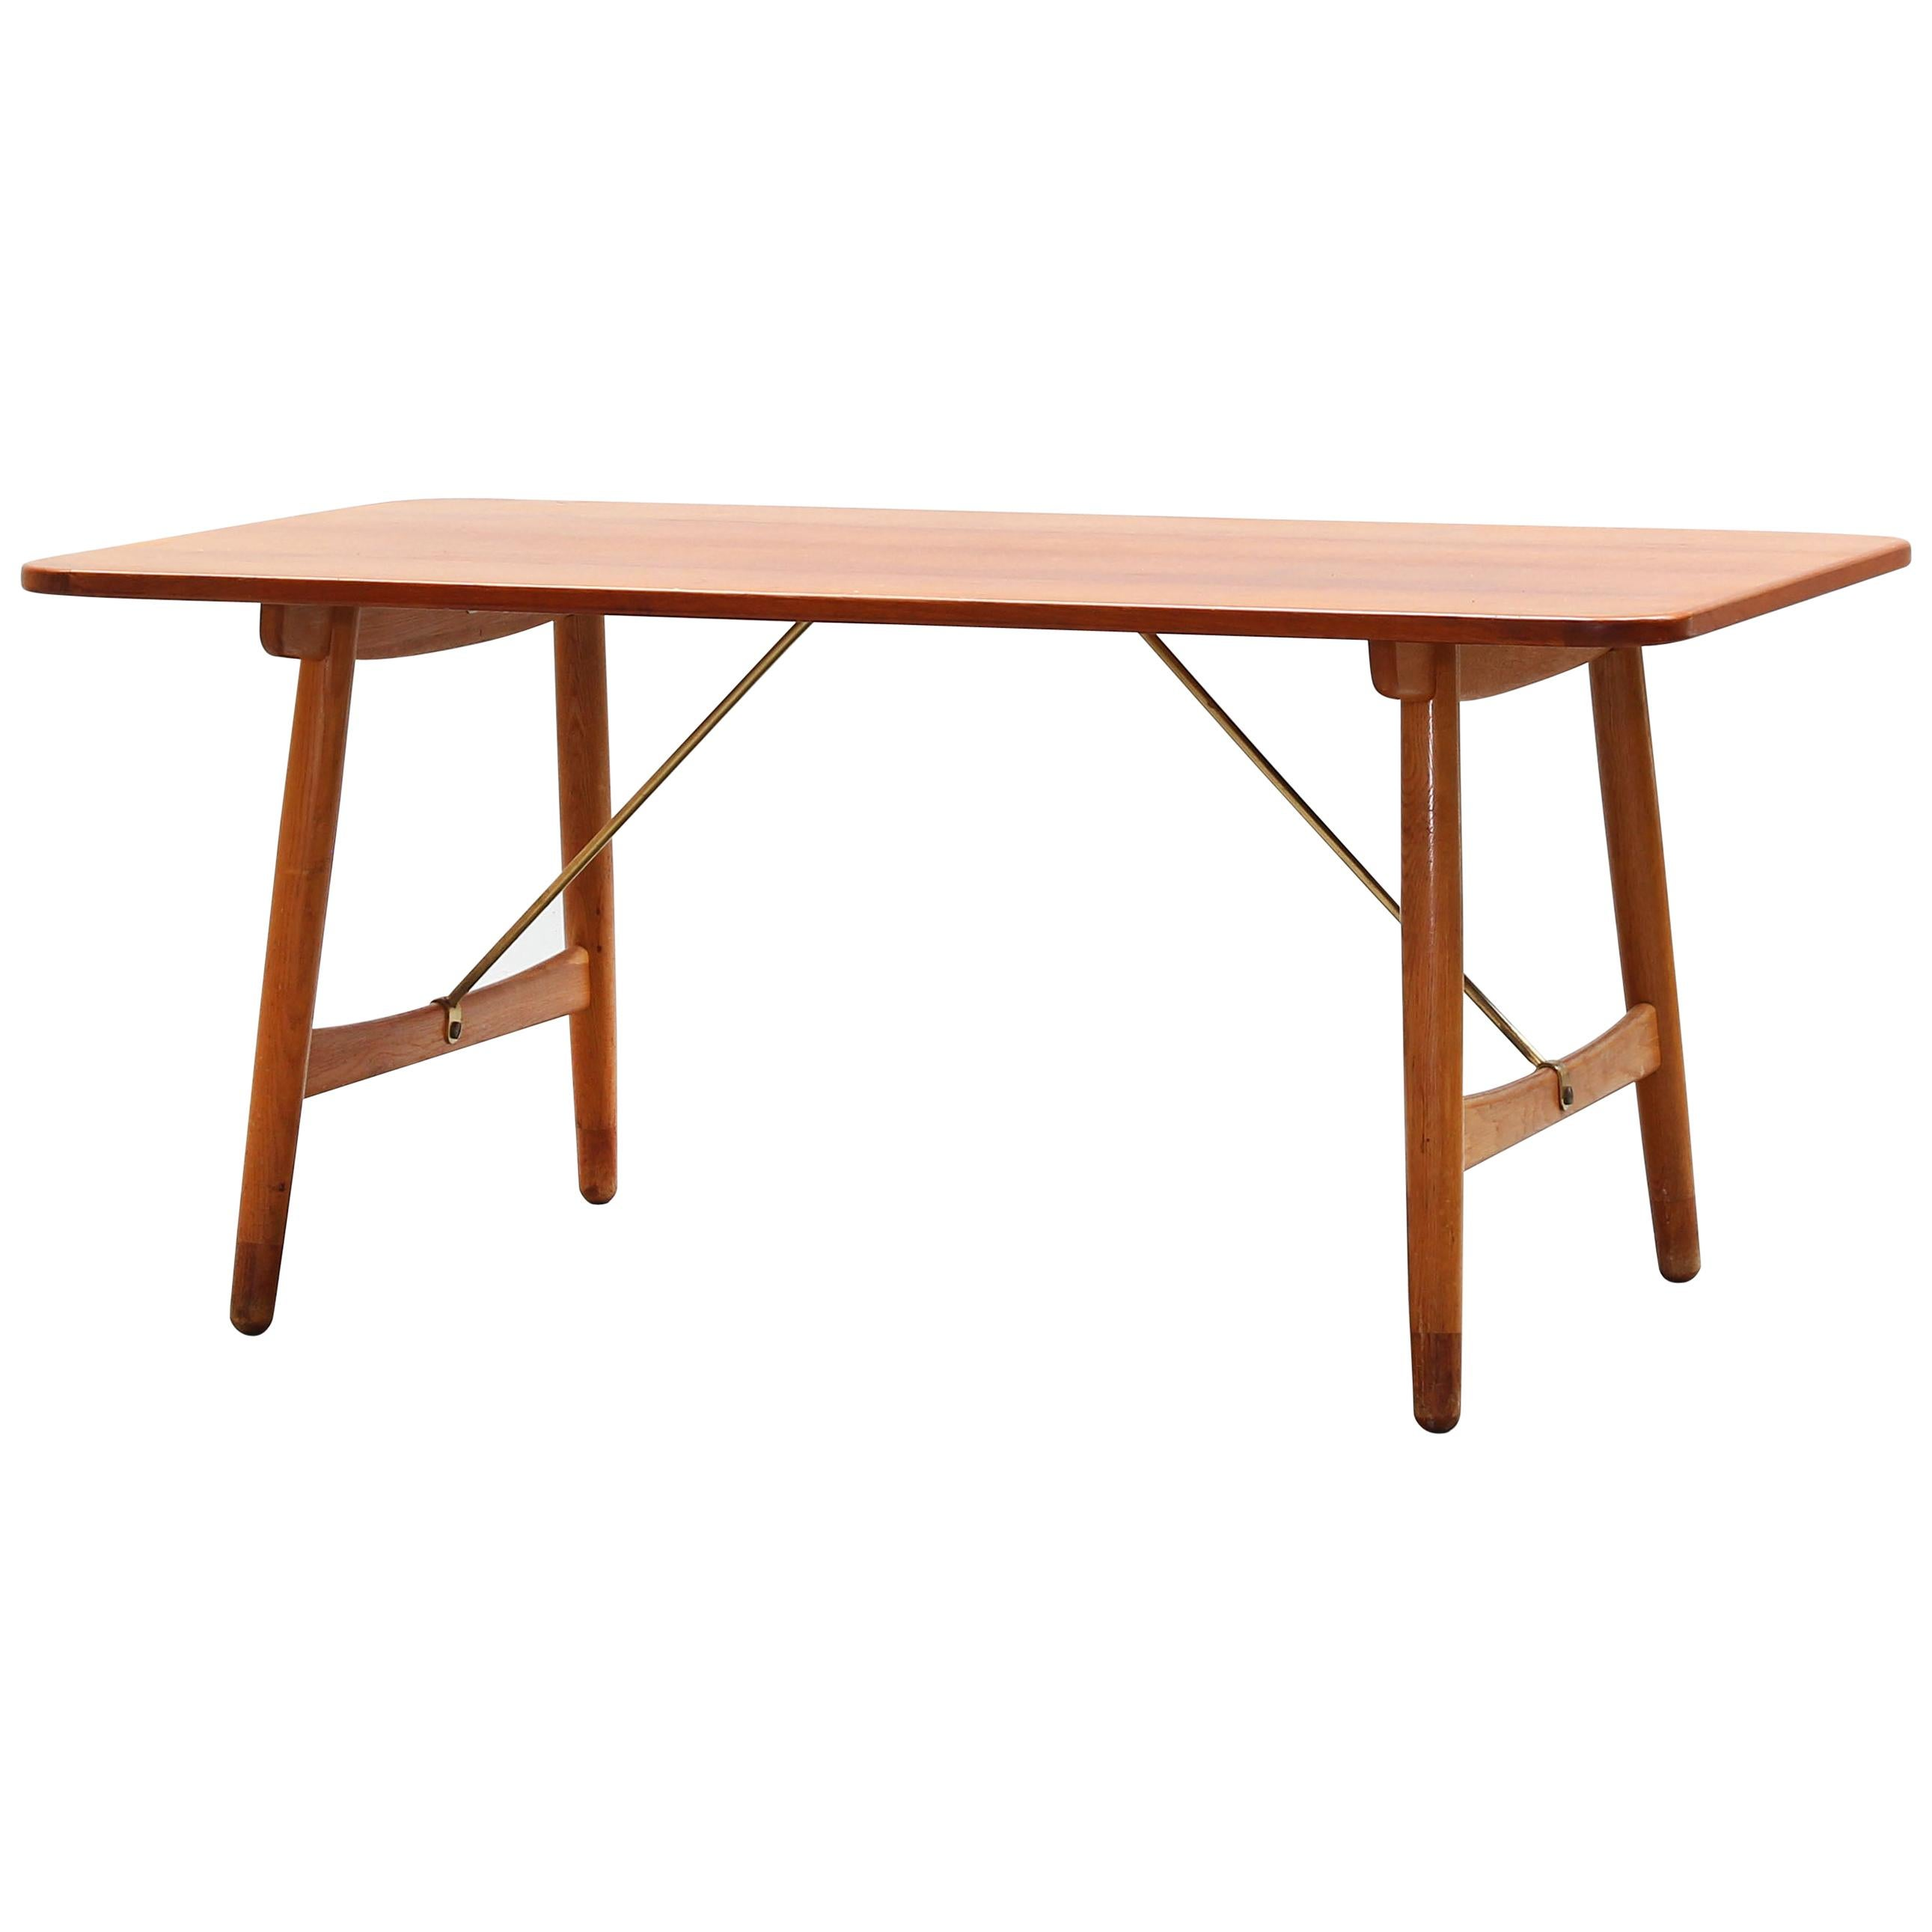 Danish Dining Table by Børge Mogensen for Søborg Mobler, Teak and Oak